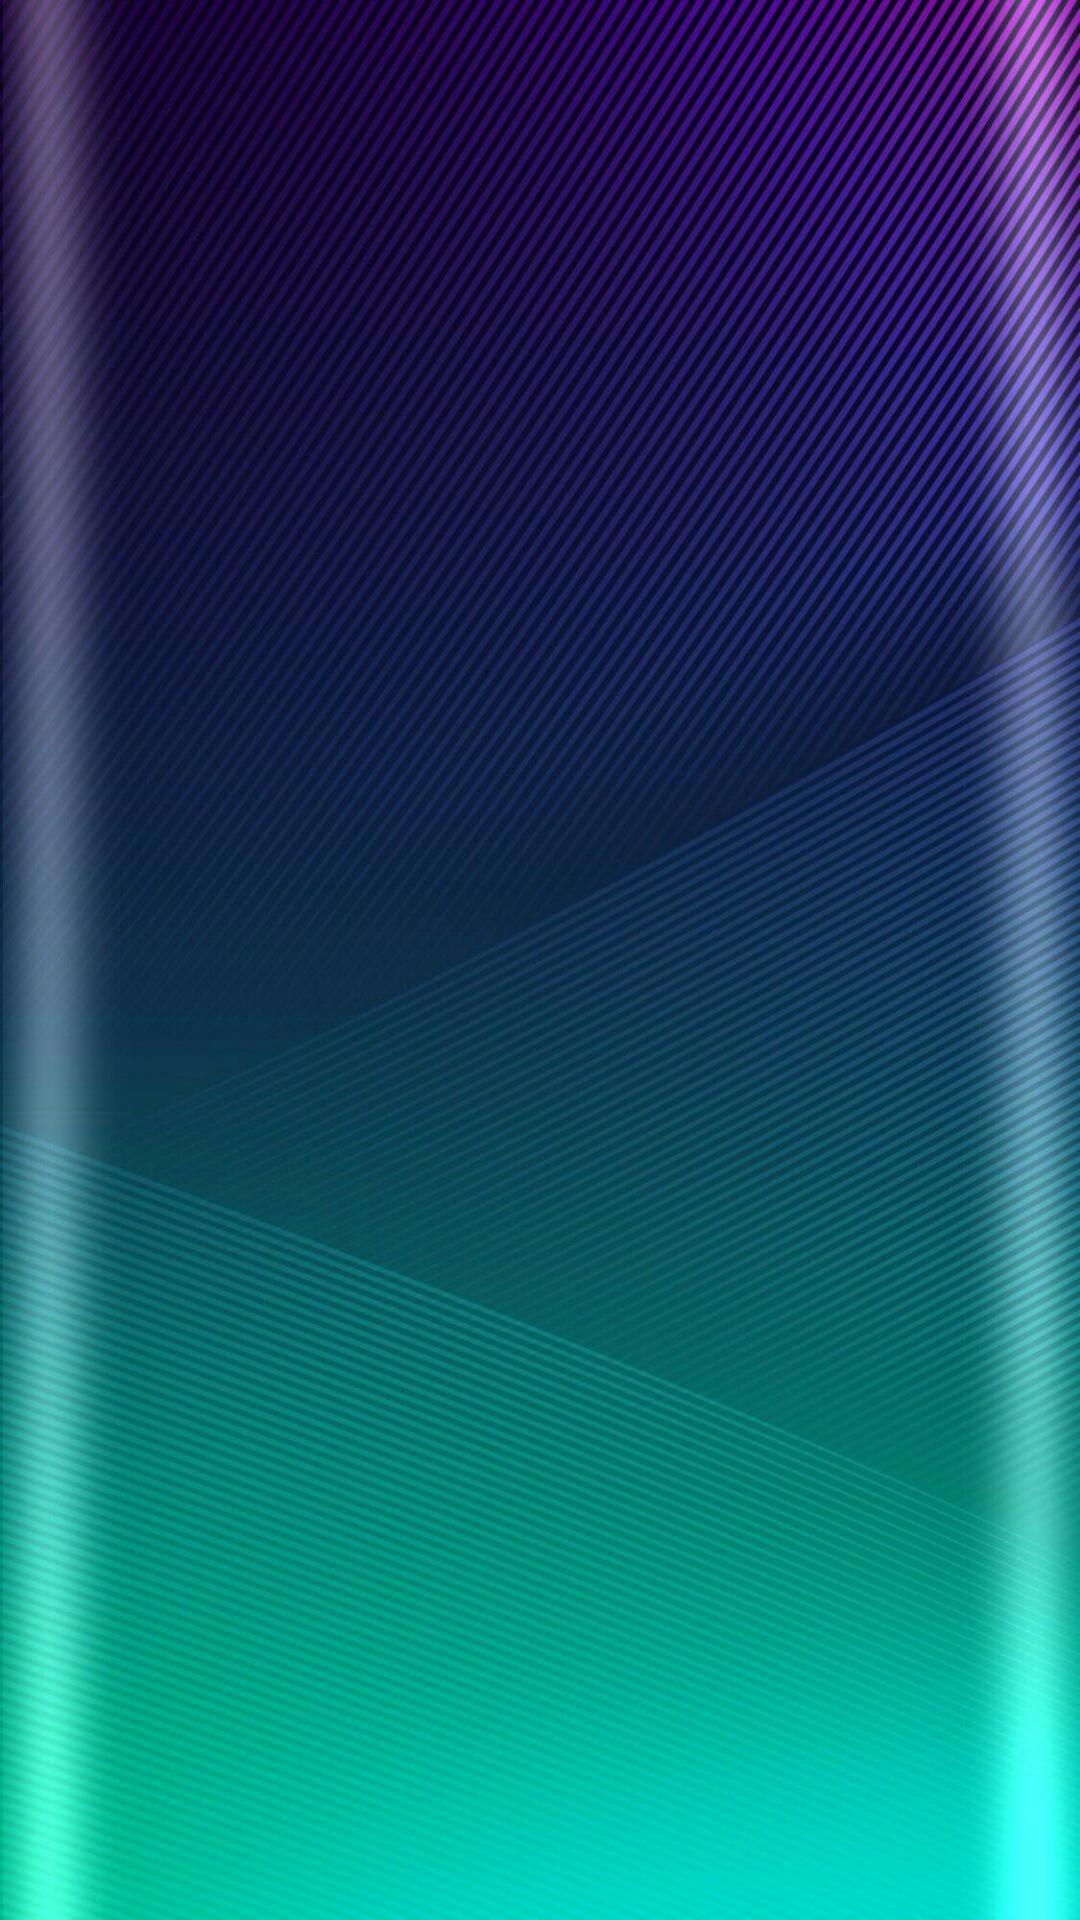 Free Download Samsung Iphone Edge Phonetelefon Hd Wallpaper 1125x2000 For Your Desktop Mobile Tablet Explore 26 Samsung Hd Wallpapers Hd Samsung Wallpapers Samsung Wallpaper Hd Samsung Wallpapers Hd